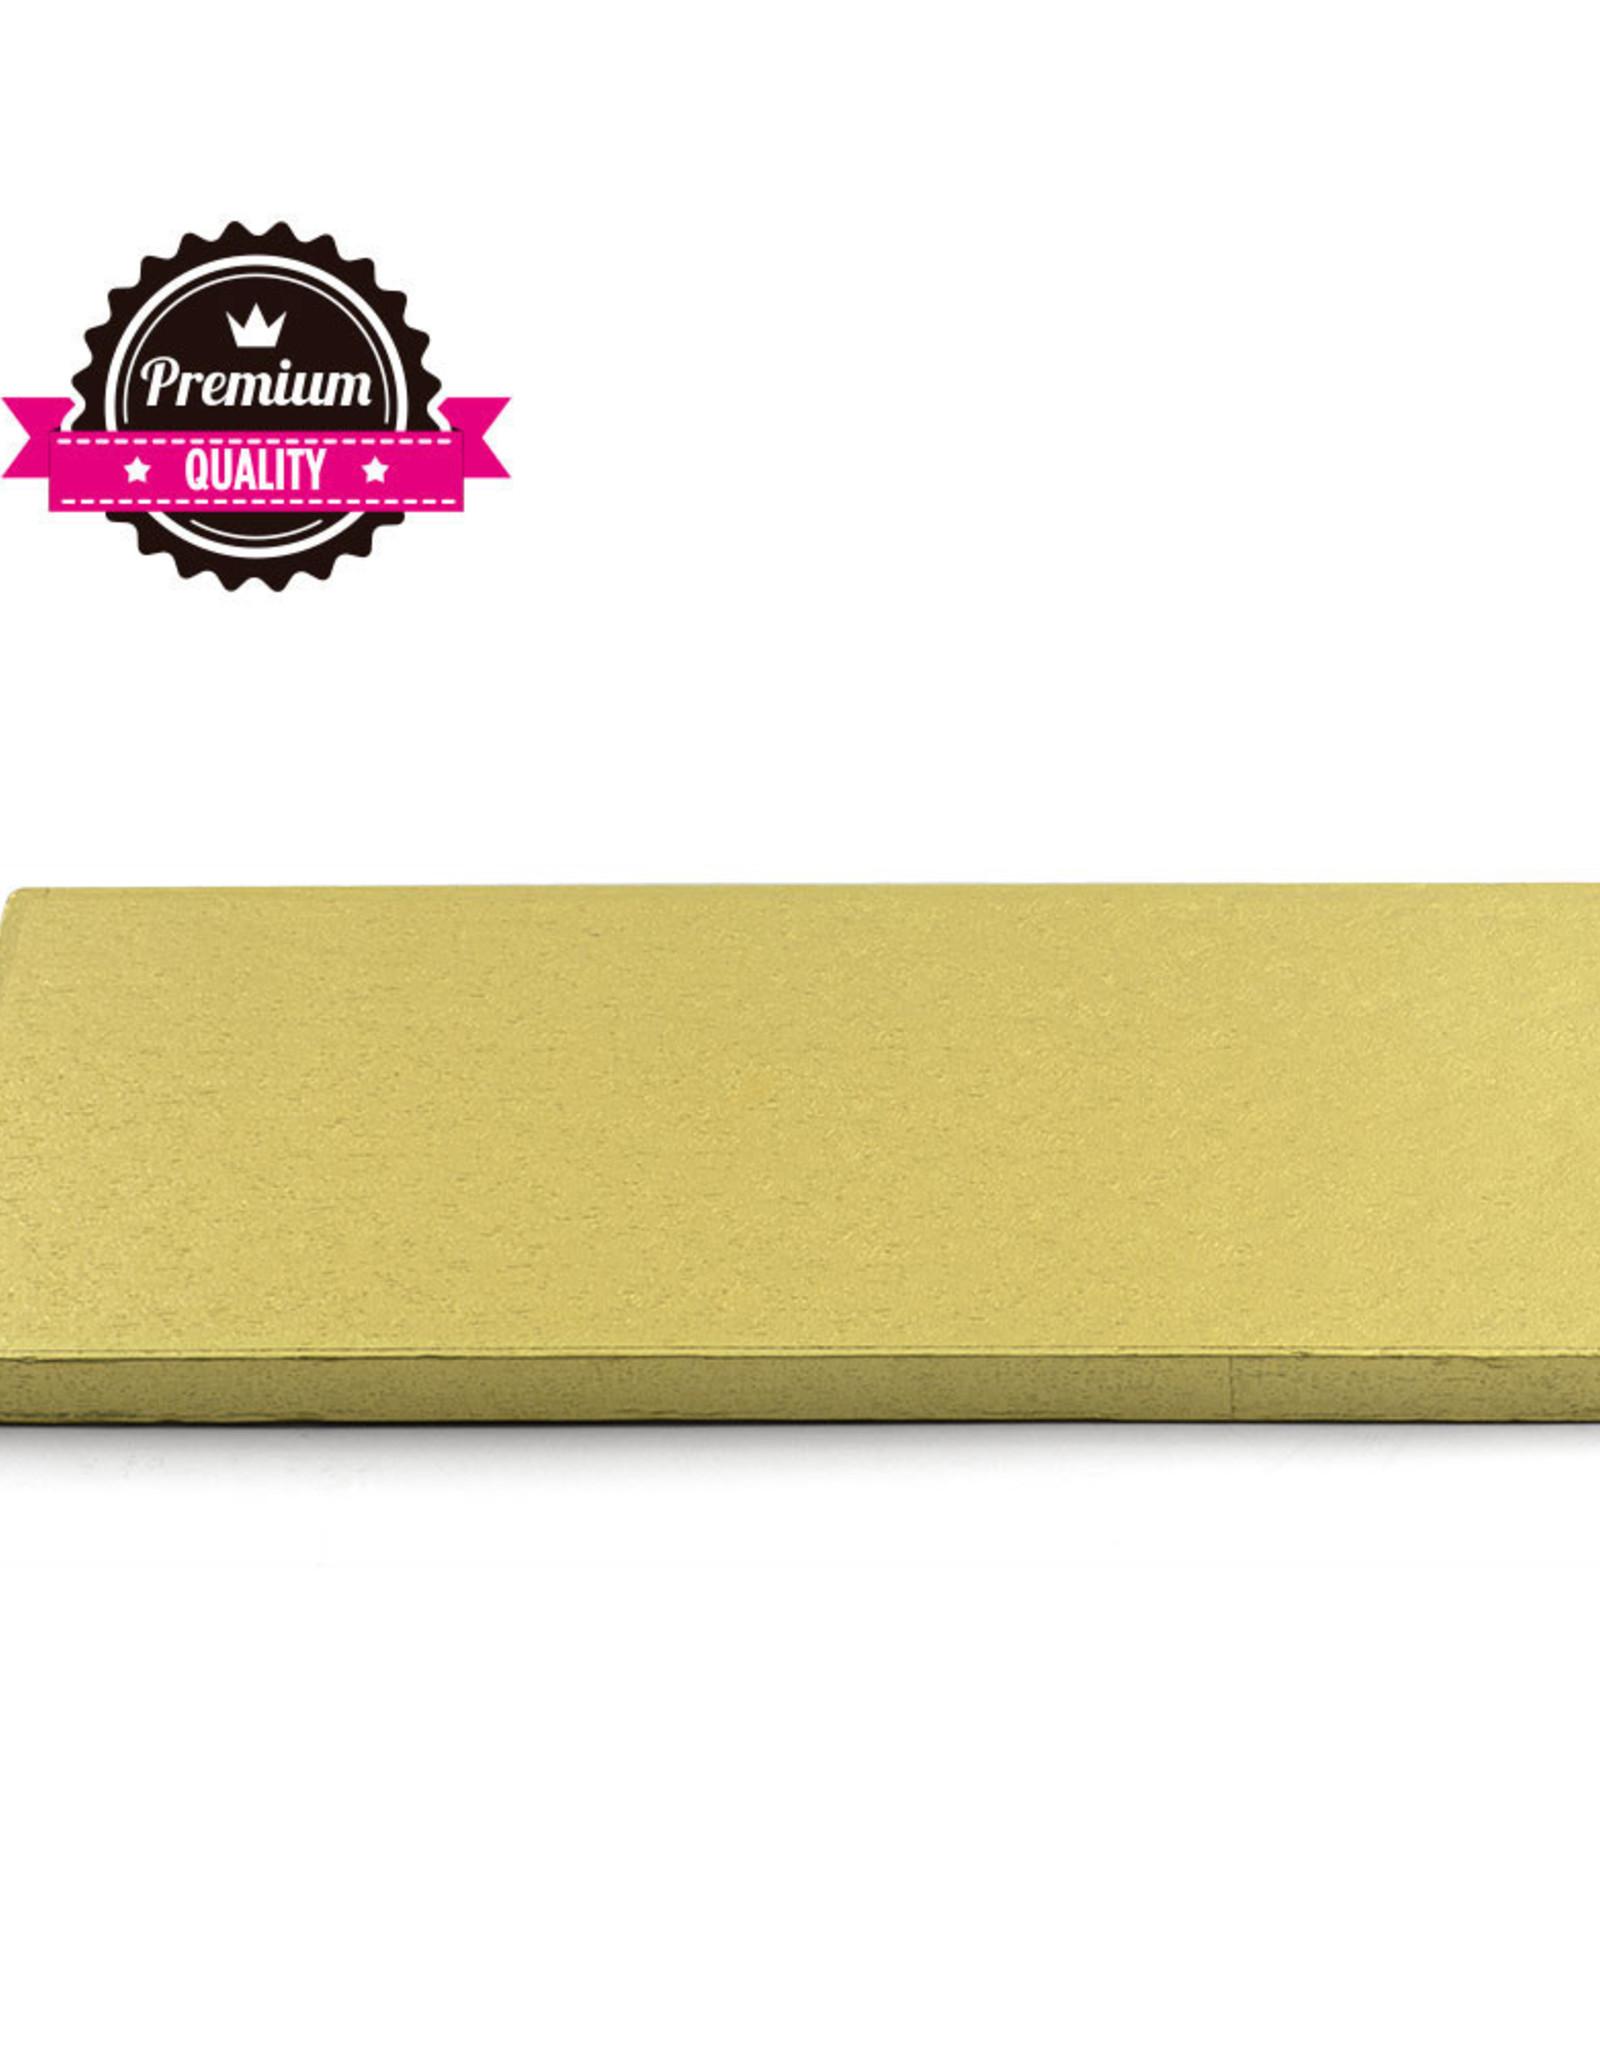 Decora Cake Drum Rechthoek 45x35cm Gold